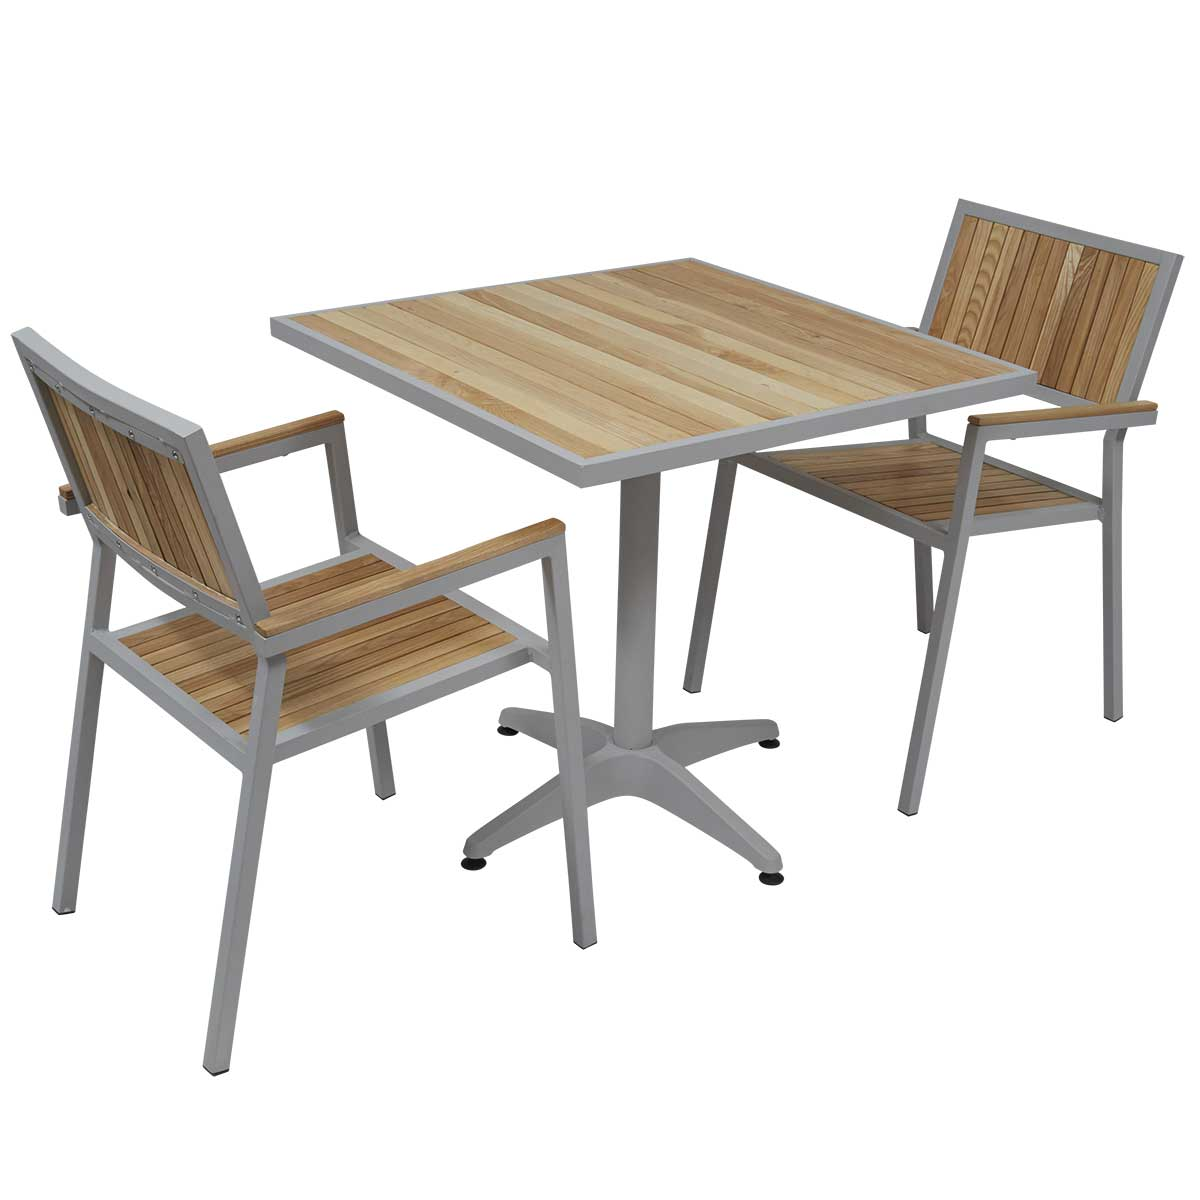 Table Chaise Terrasse Frais Table Terrasse Pas Cher